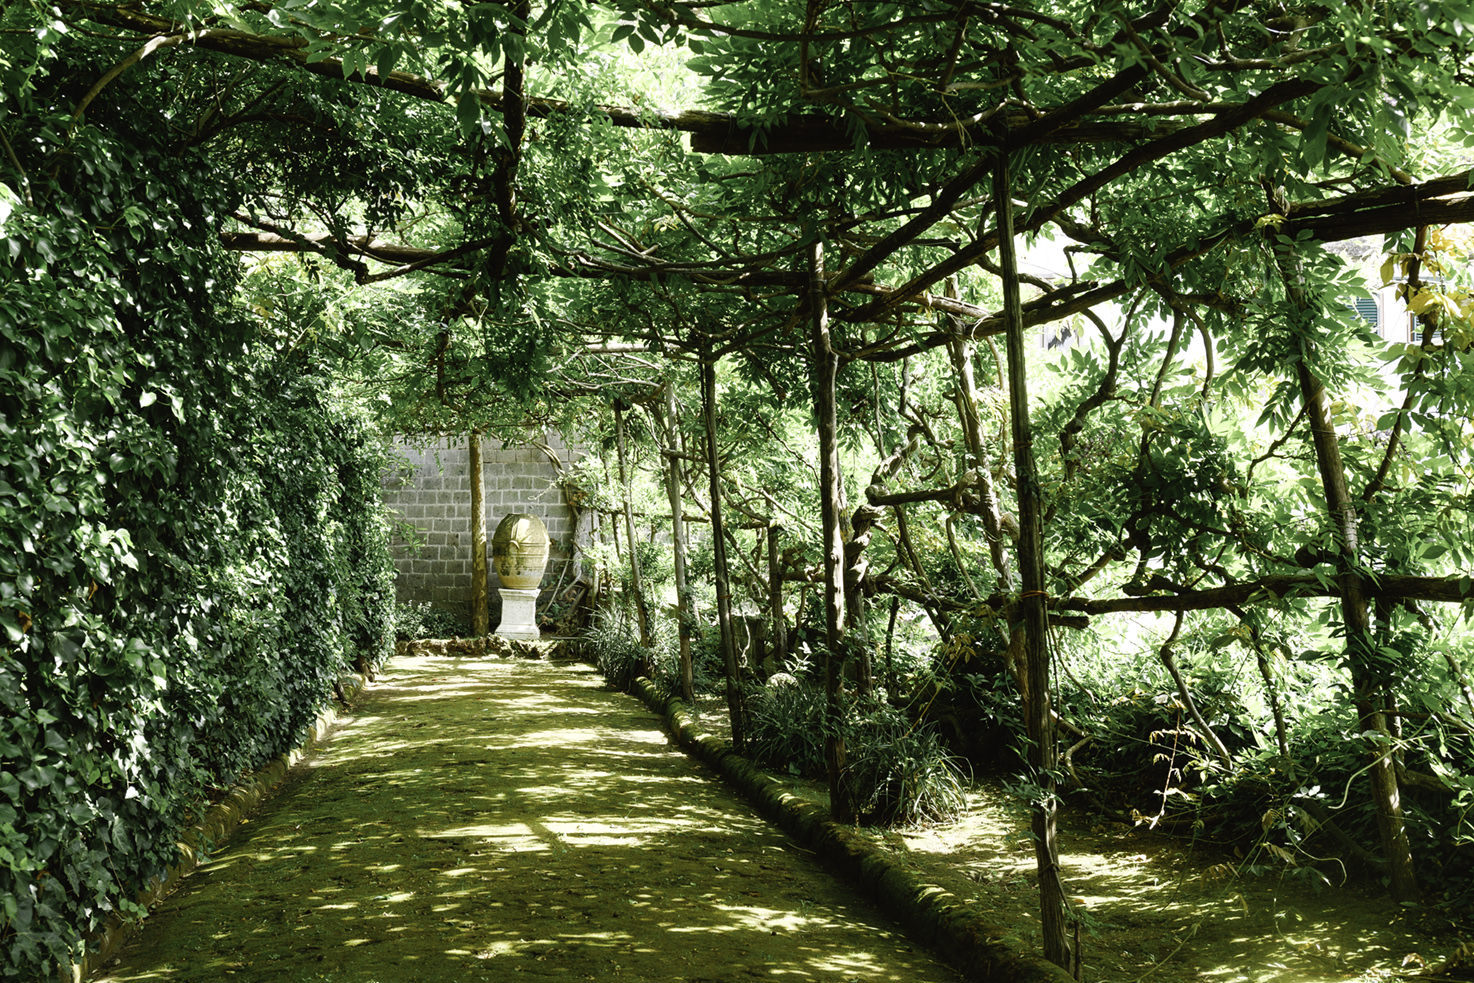 Gardens of Villa Astor in Sorrento